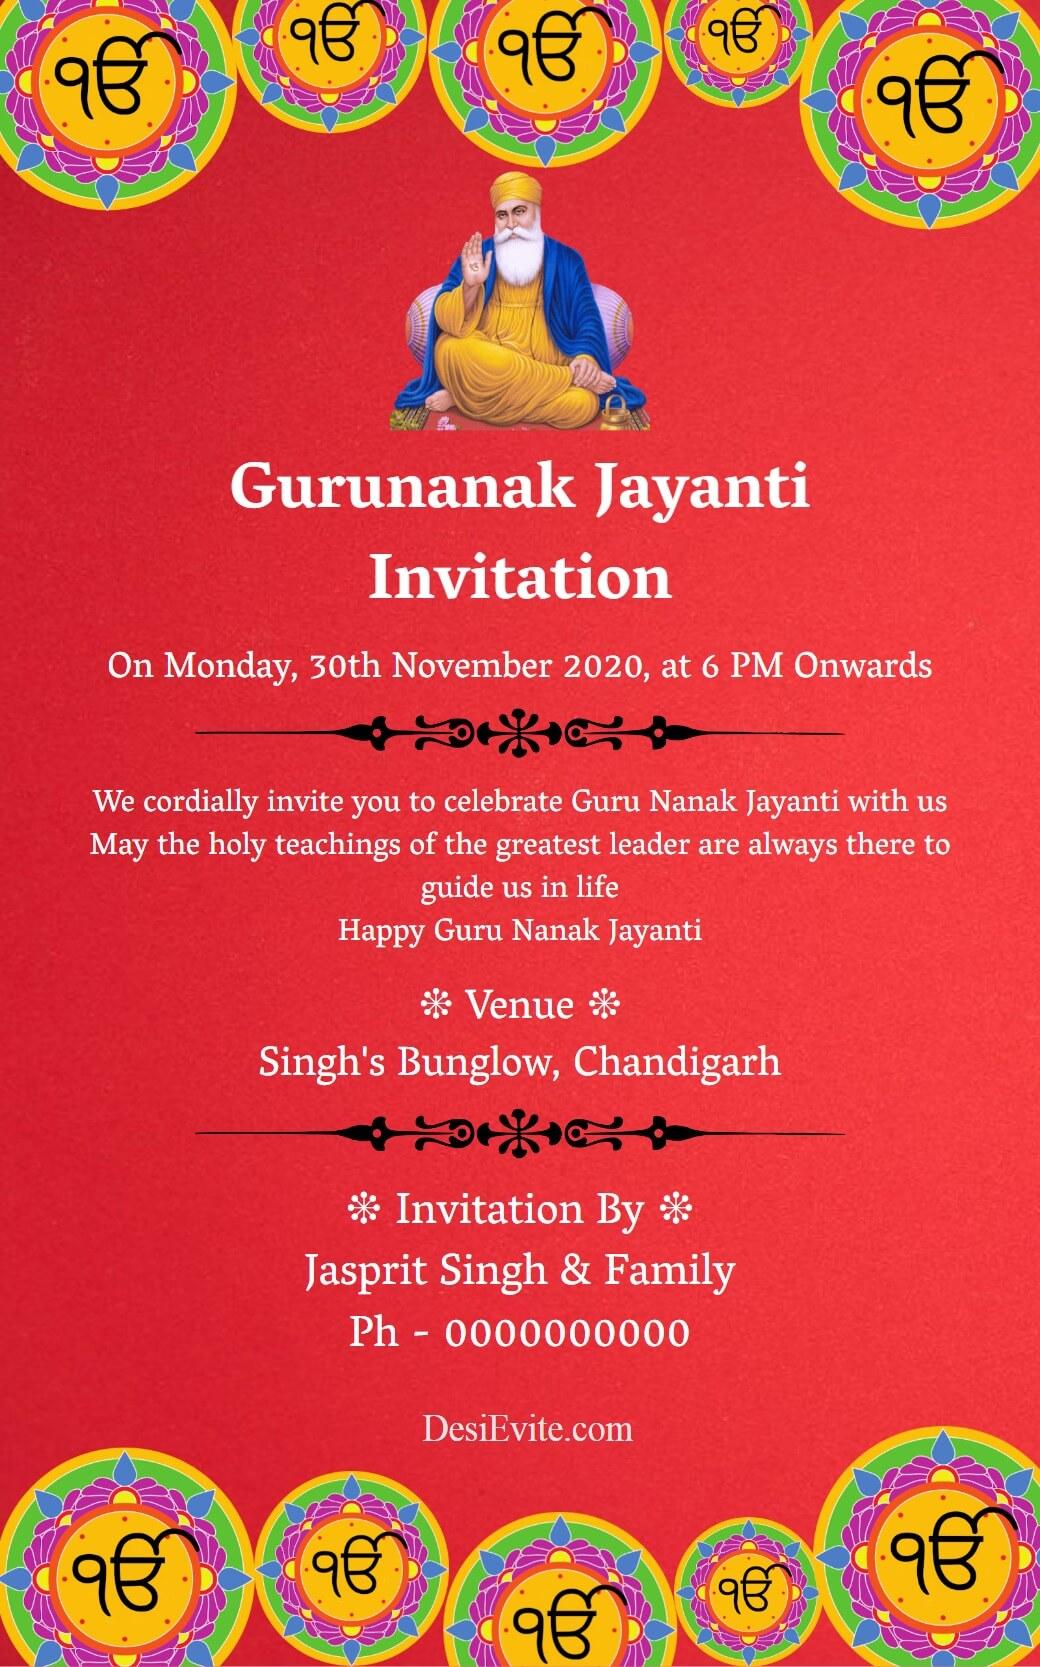 guru nanak jayanti invitation ecard template 74